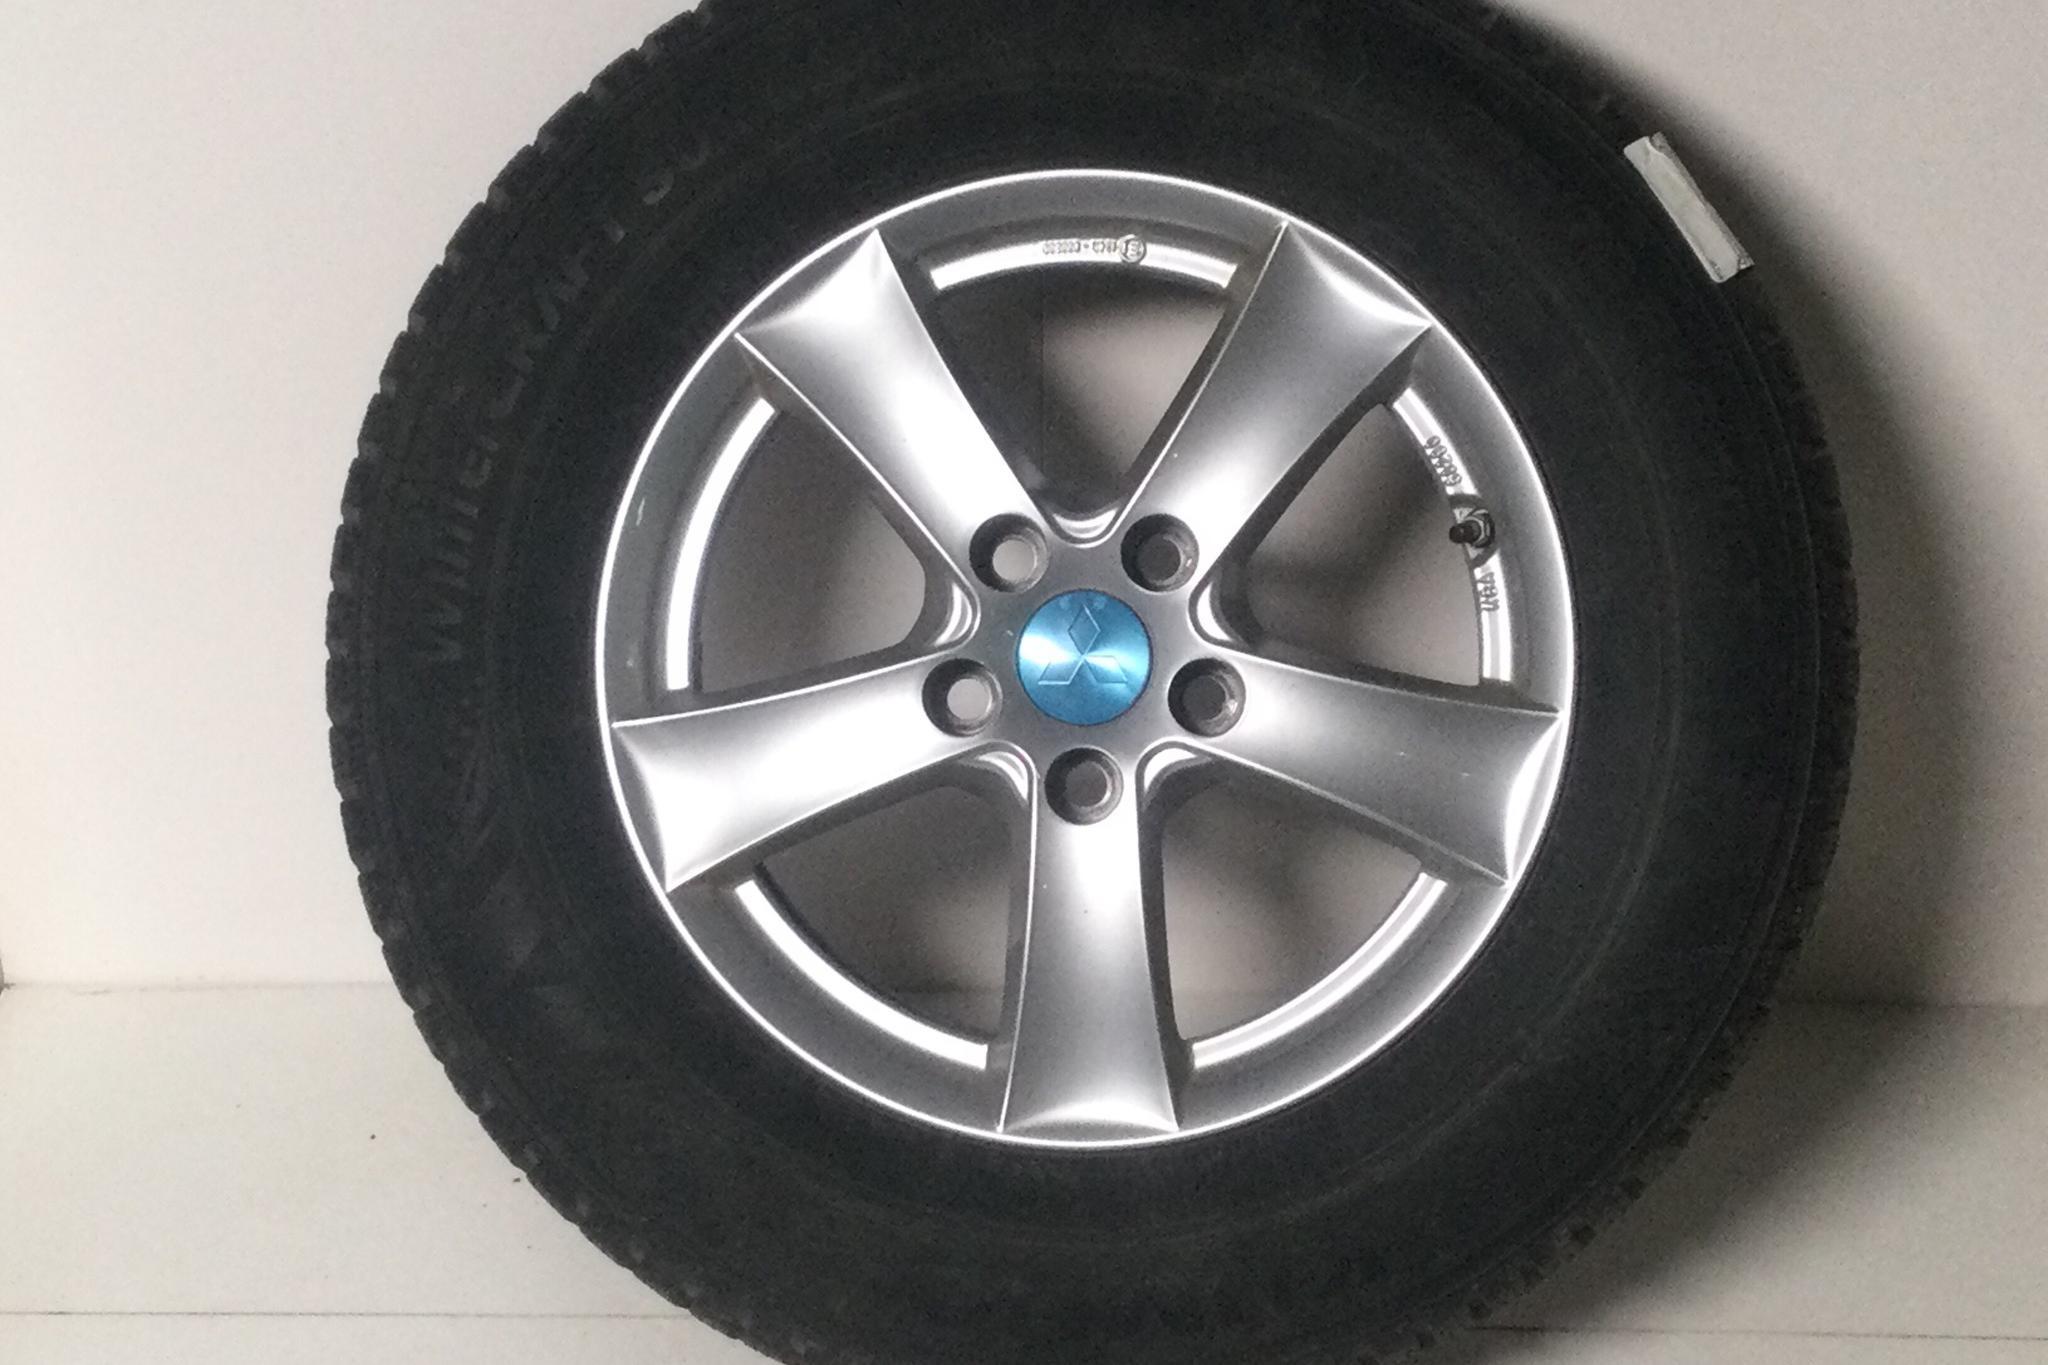 Mitsubishi Outlander 2.0 Plug-in Hybrid 4WD (121hk) - 157 730 km - Automatic - gray - 2017